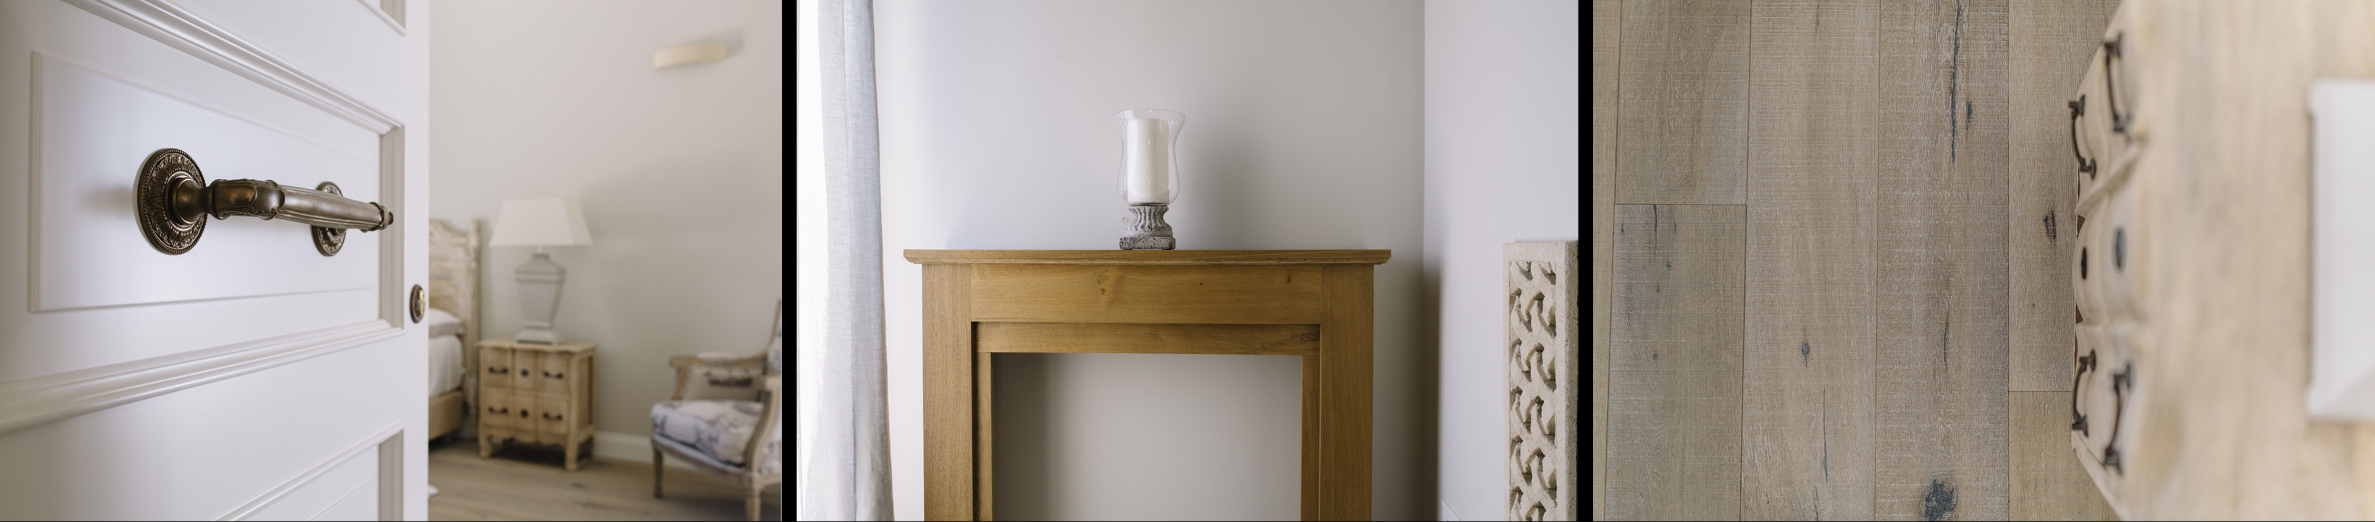 room wood floor dettagli interior fotografo matera professionista photographicframe giuseppe manzi